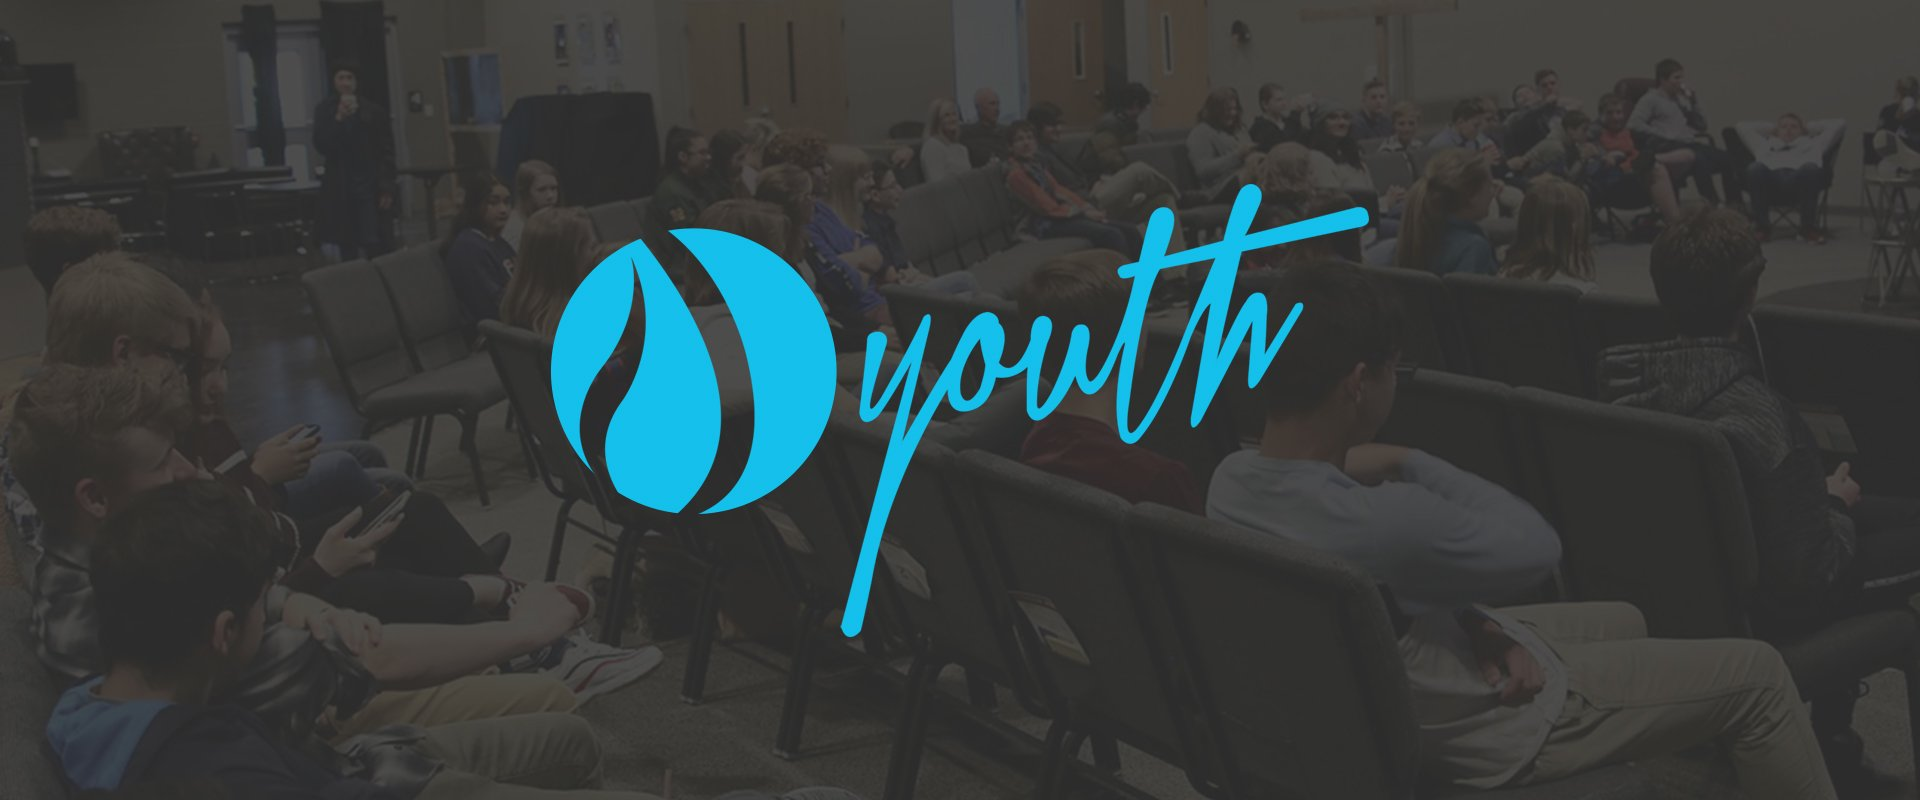 youth-header